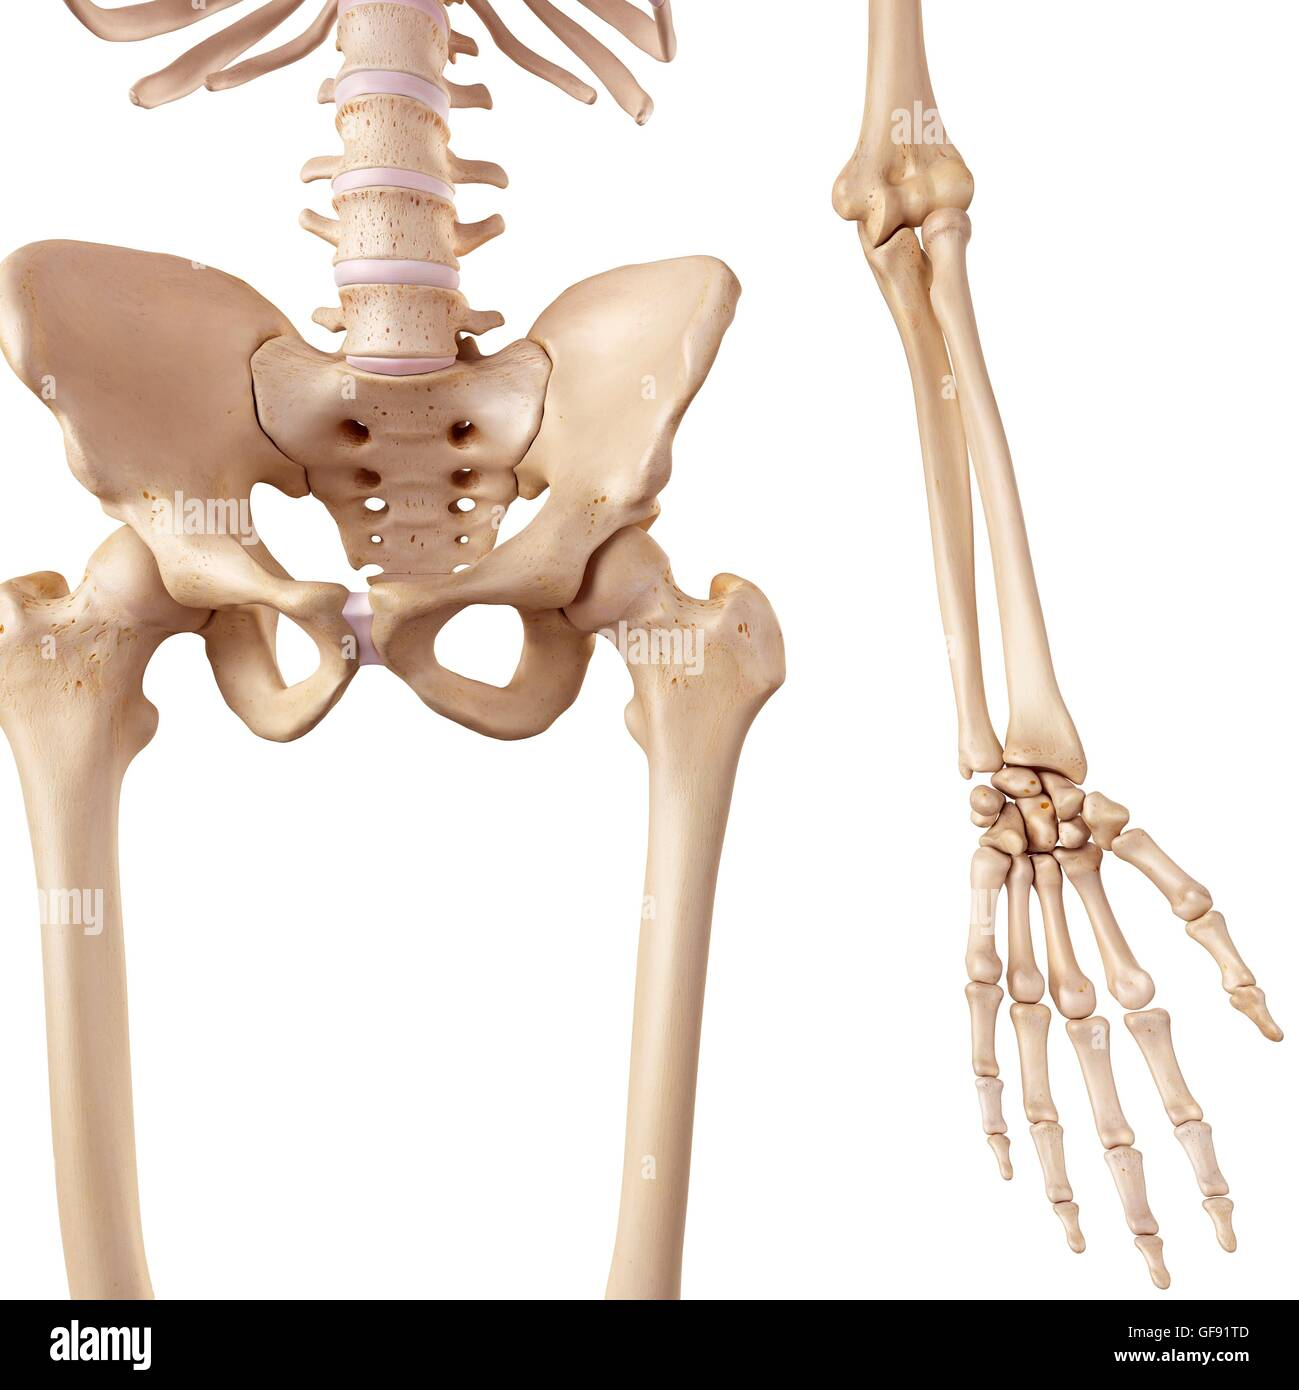 Human Hip Bones Illustration Stock Photo 112681085 Alamy